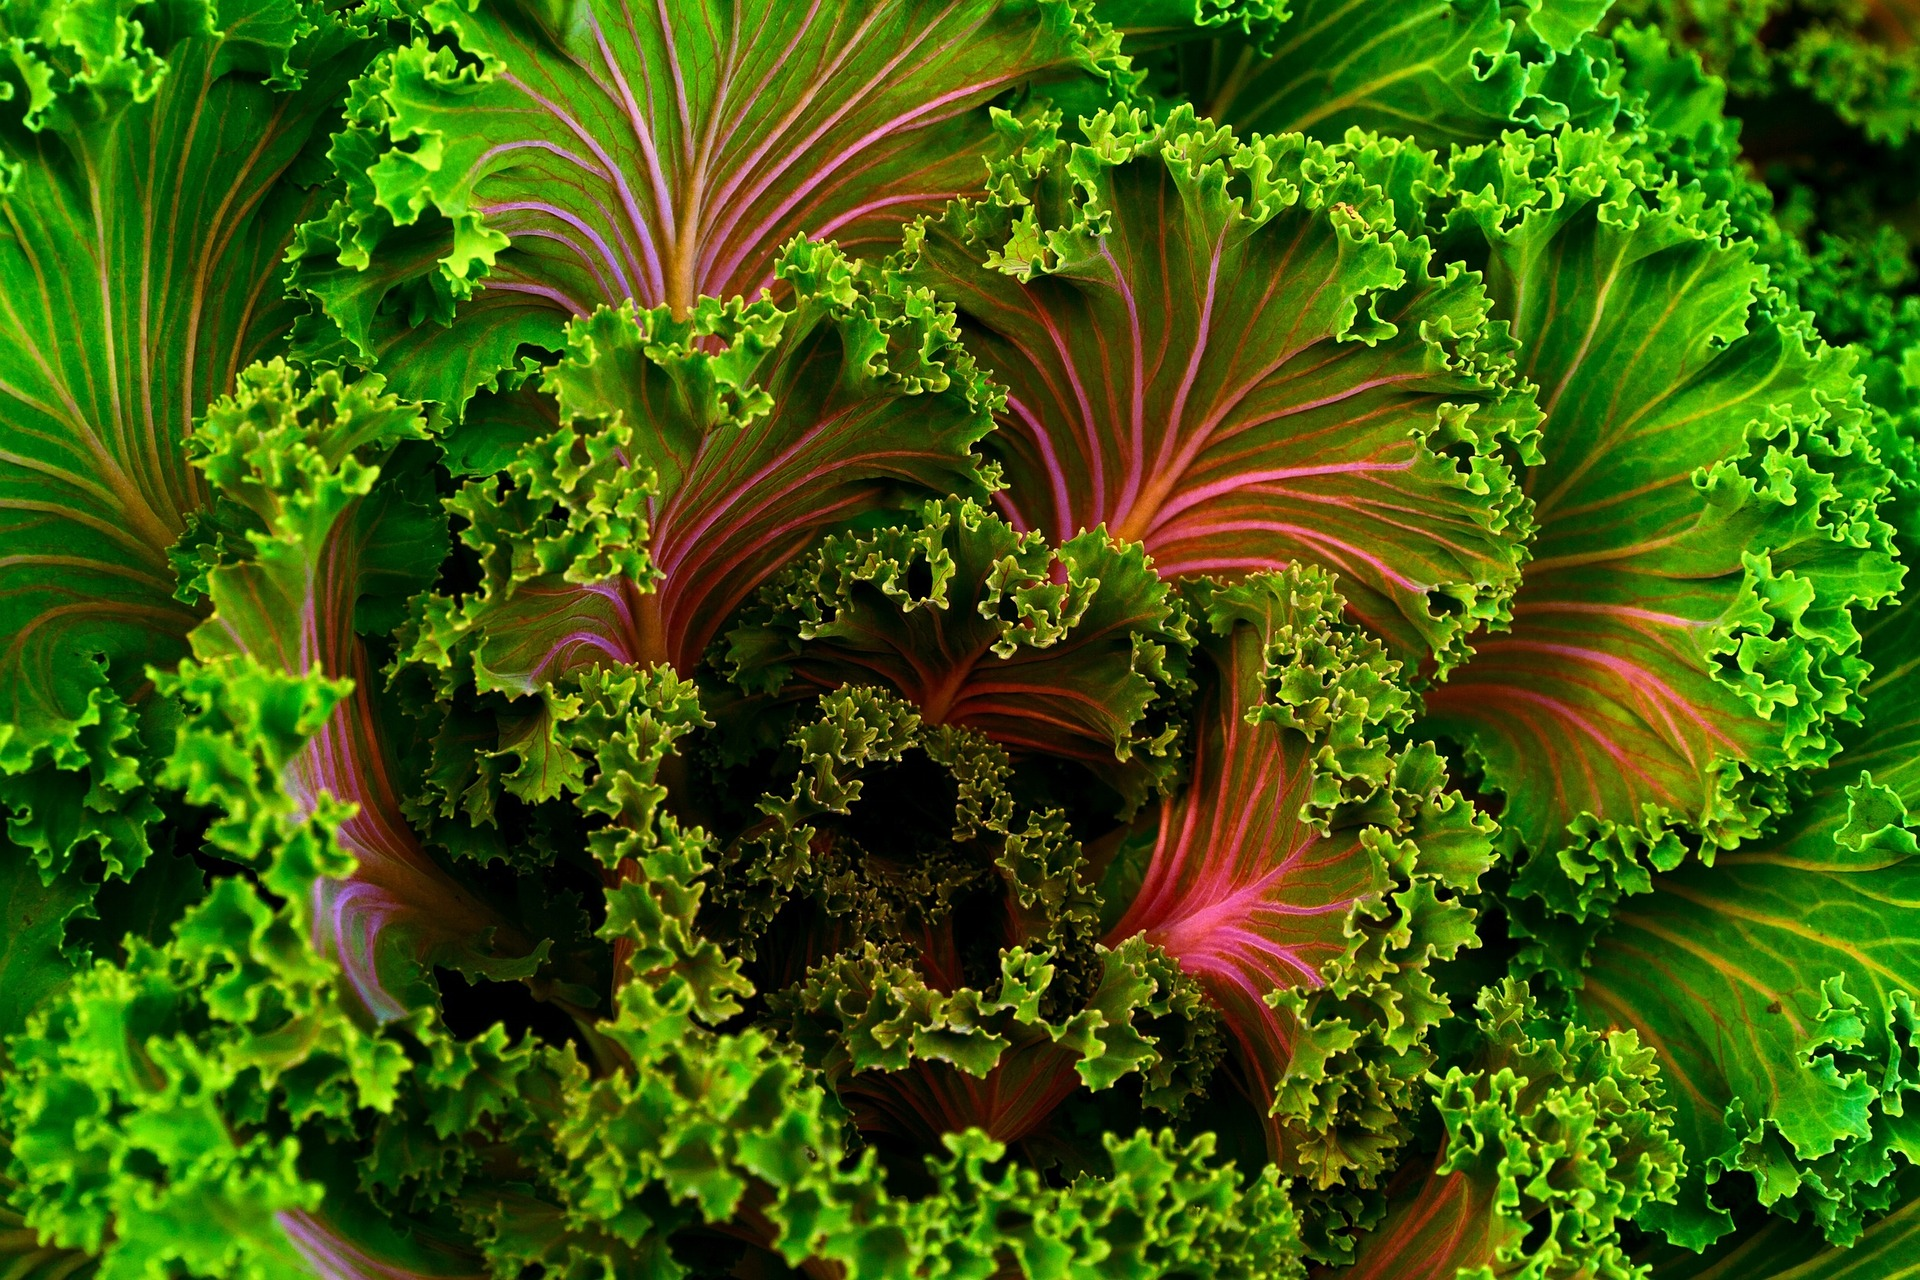 Kale-690051_1920.jpg